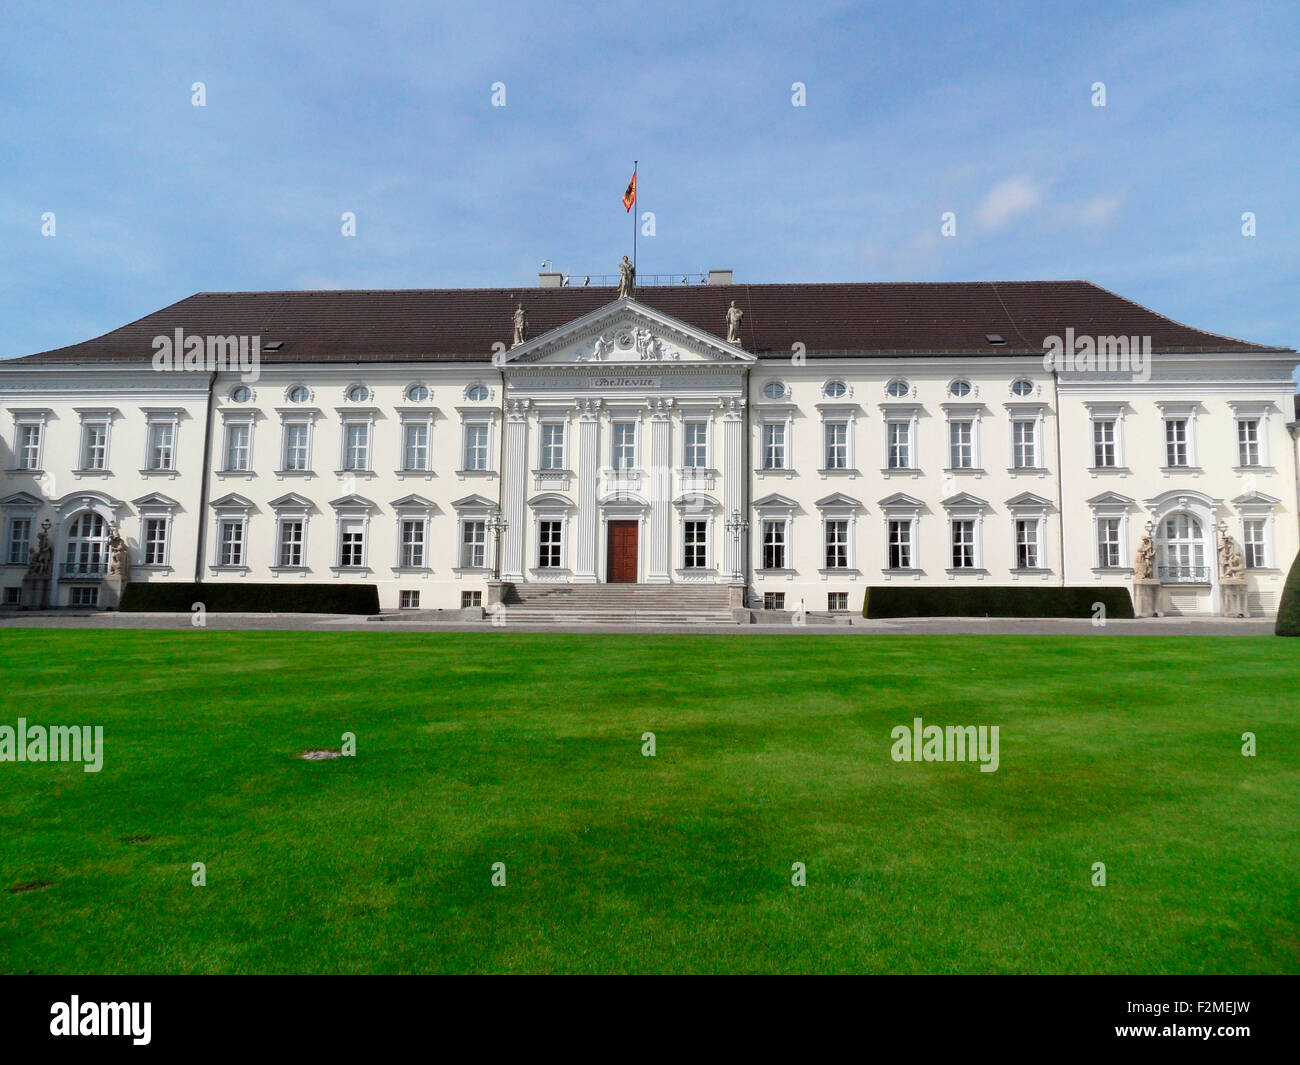 Impressionen - Tag der Besorgnis Tuer, Schloss Bellevue, 9. September 2012, Berlin. Stockbild